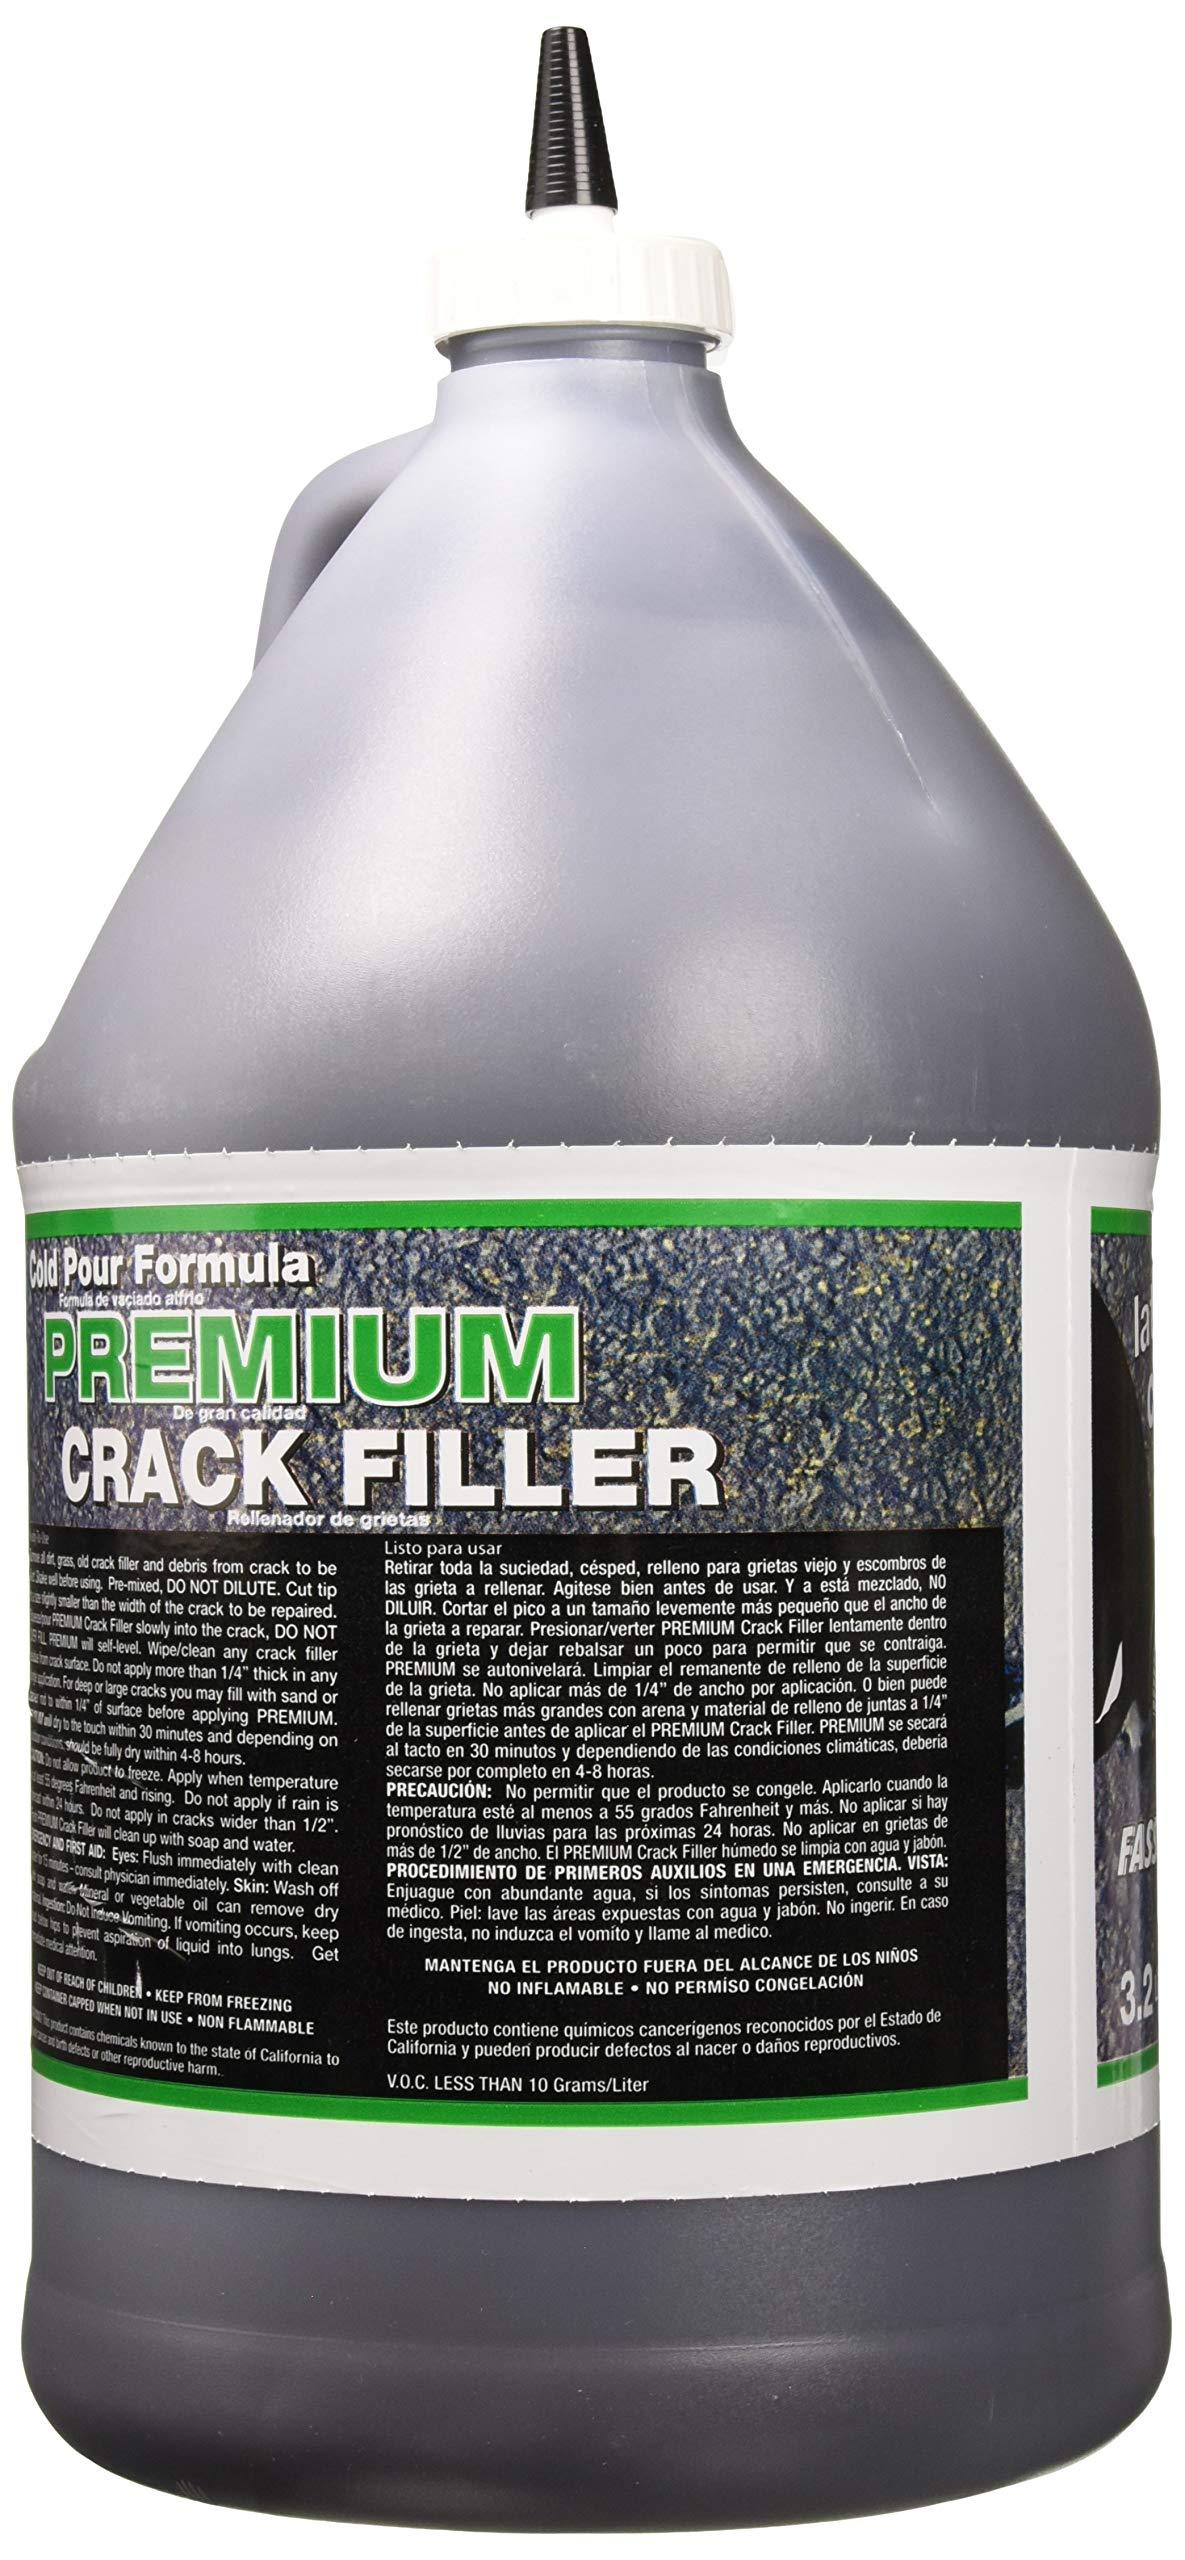 DALTON ENTERPRISES 31623 Latex-Ite Premium Crack Filler, 1 Gal by Dalton Enterprises (Image #3)